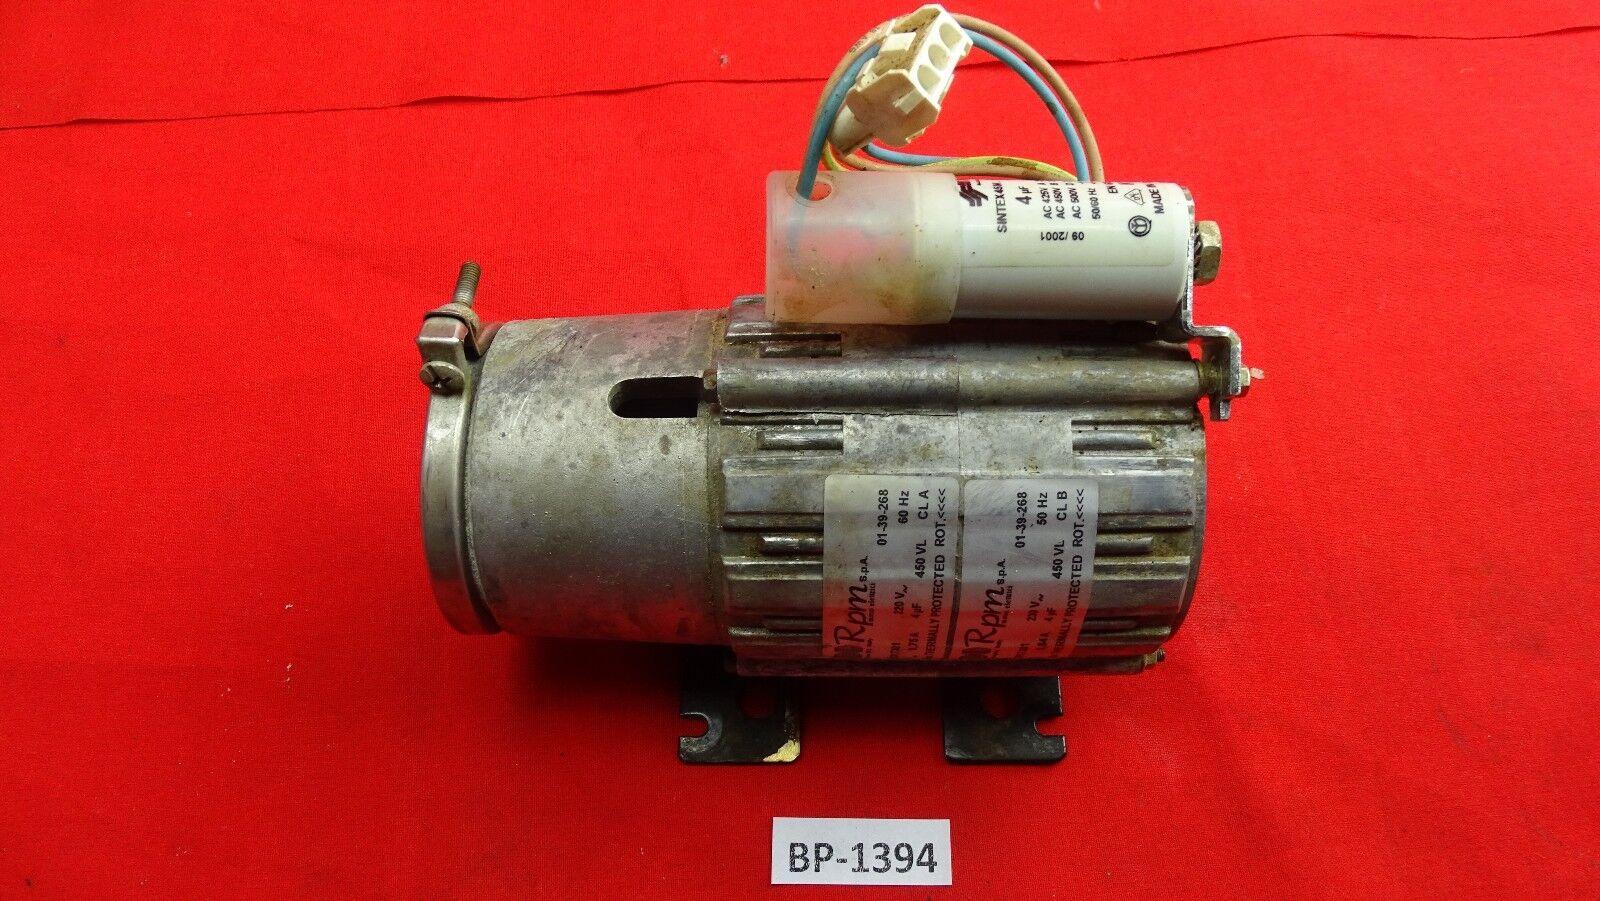 Original WMF Bistro 8100 Moteur Rpm C017301 Espresso Pompe